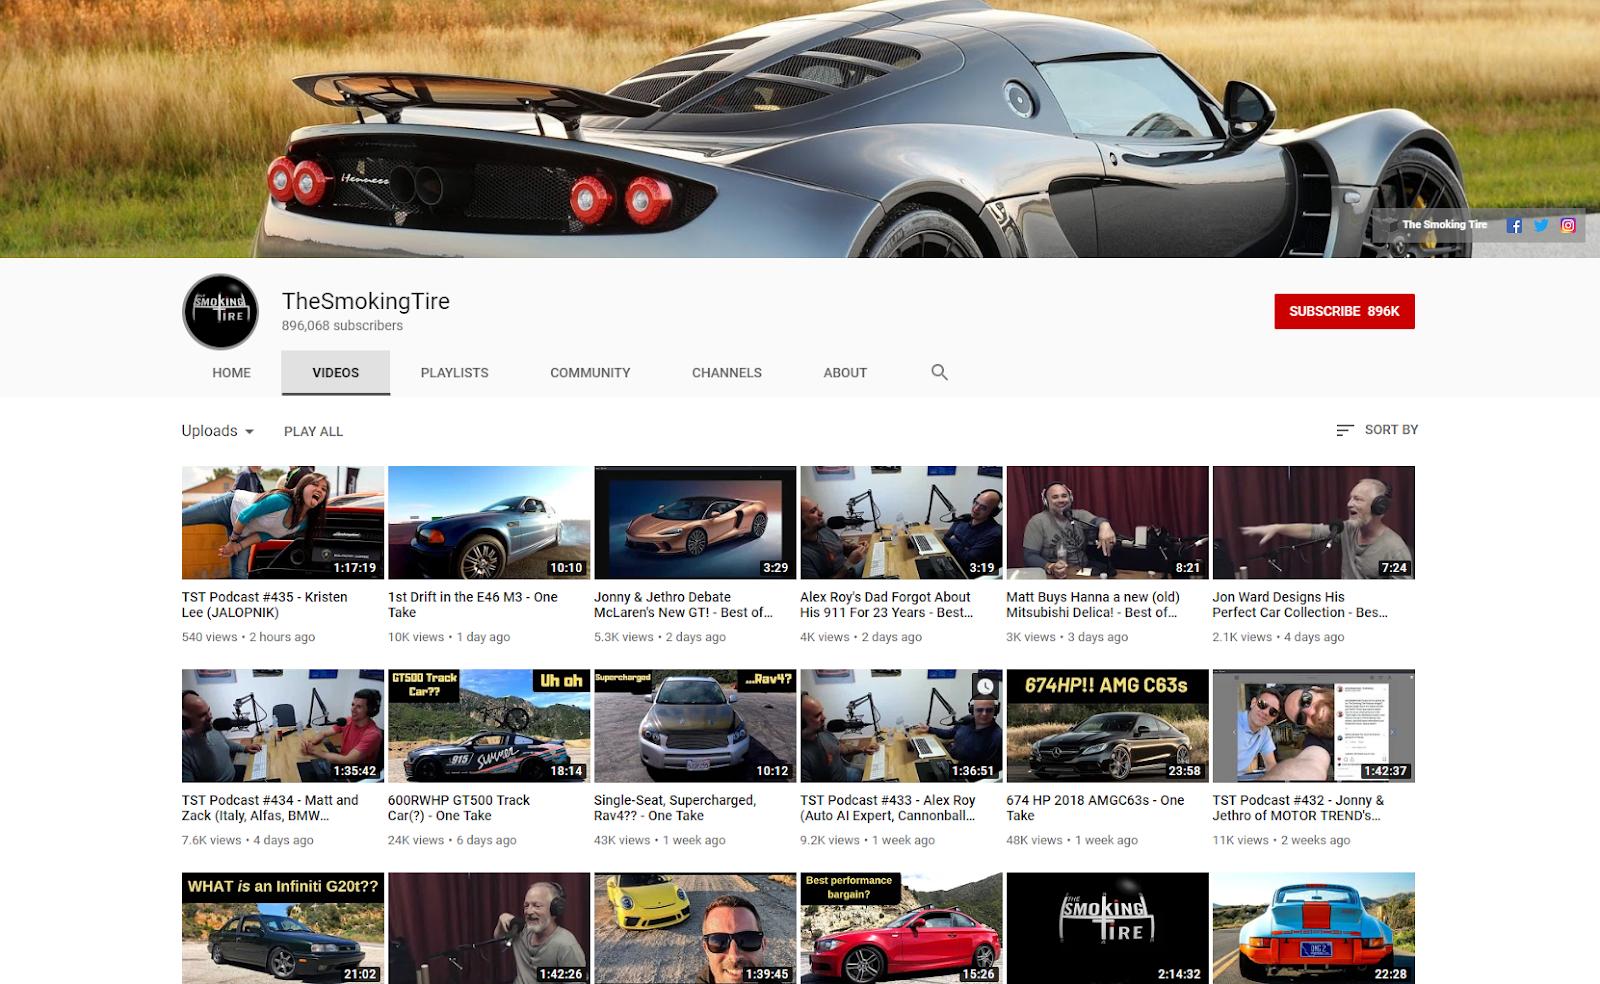 TheSmokingTire YouTube .com